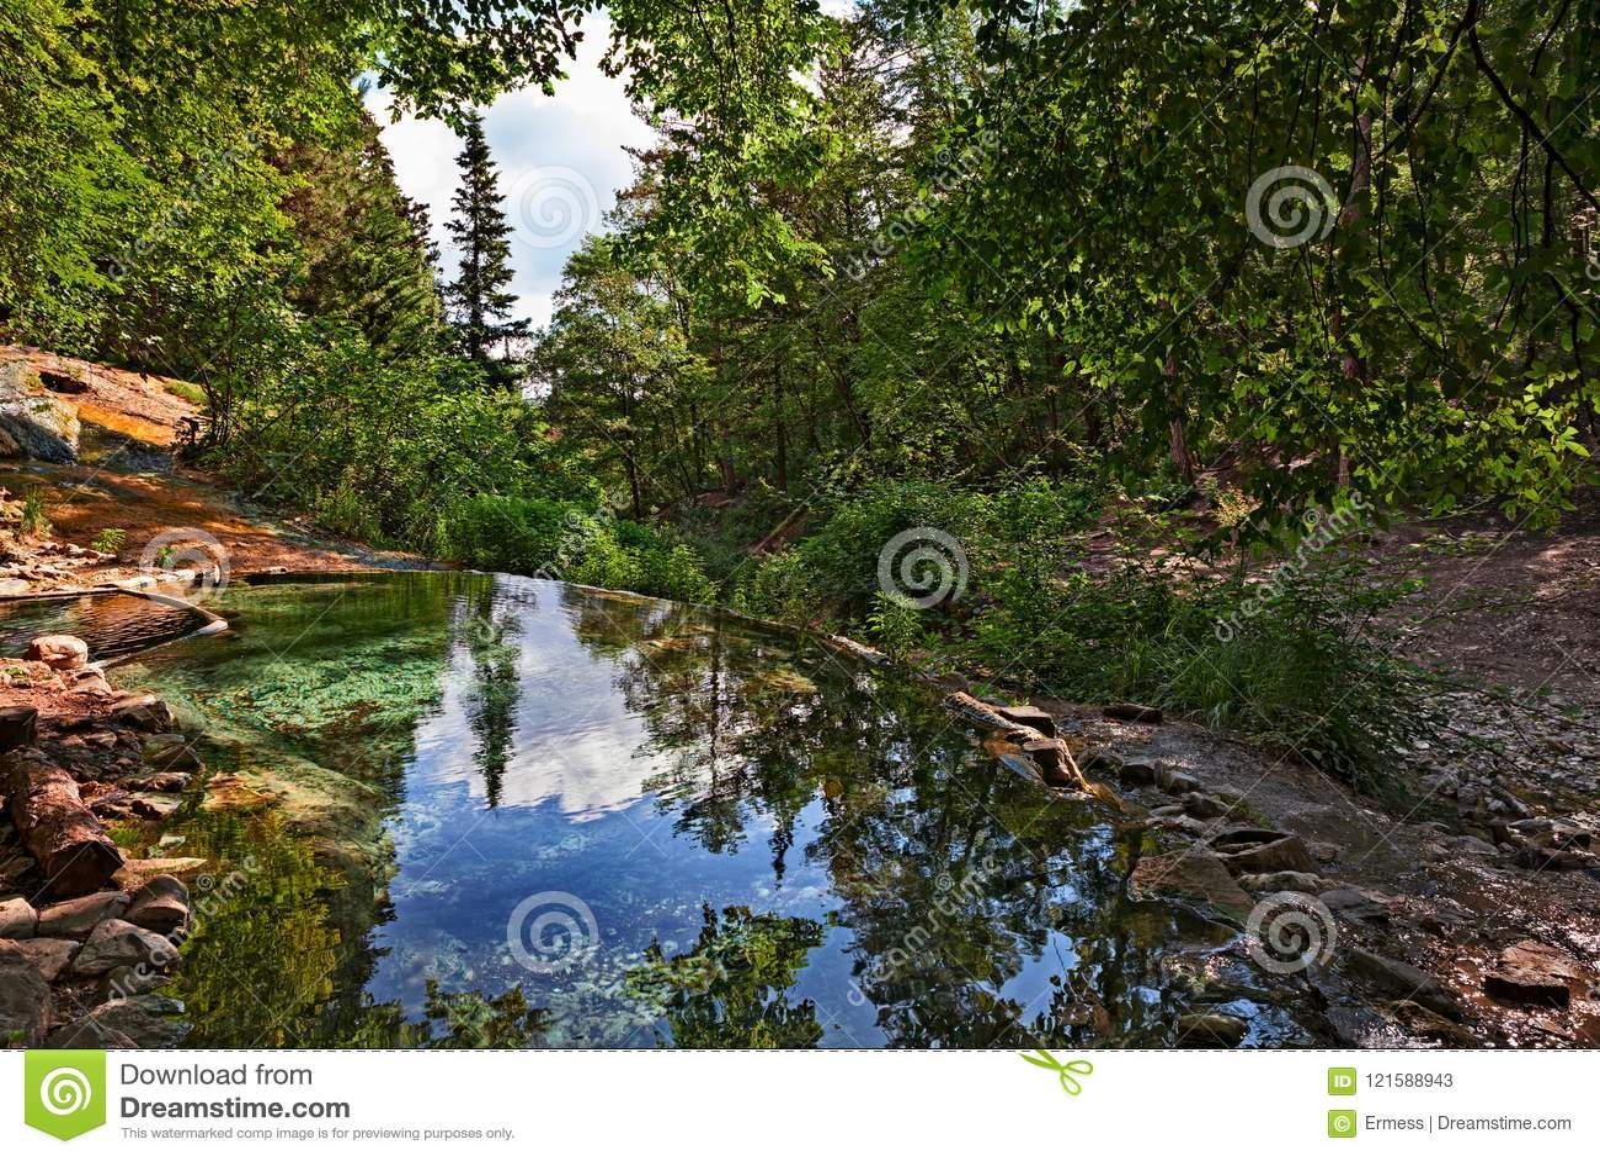 Bagni San Filippo, Siena, Toscanië, Italië: natuurlijke thermische pool i